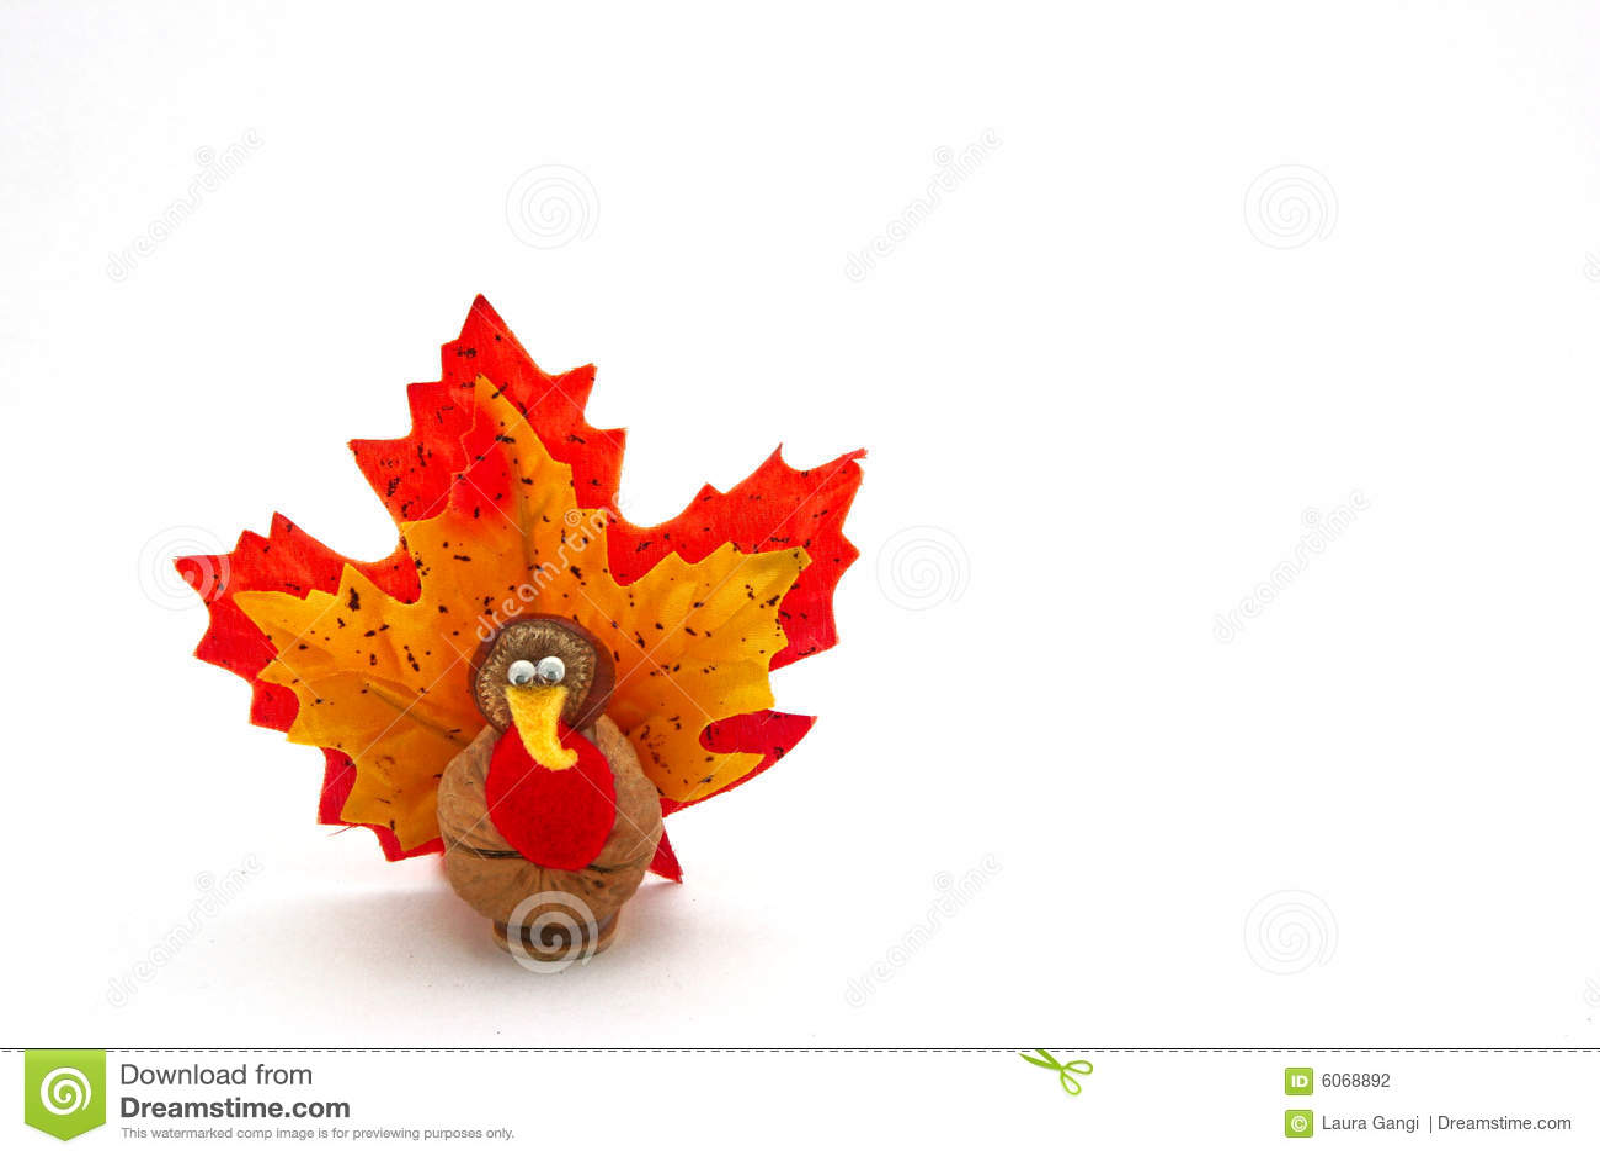 Happy Thanksgiving Greeting >> Tiny Turkey For Thanksgiving Stock Photo - Image of halloween, humorous: 6068892